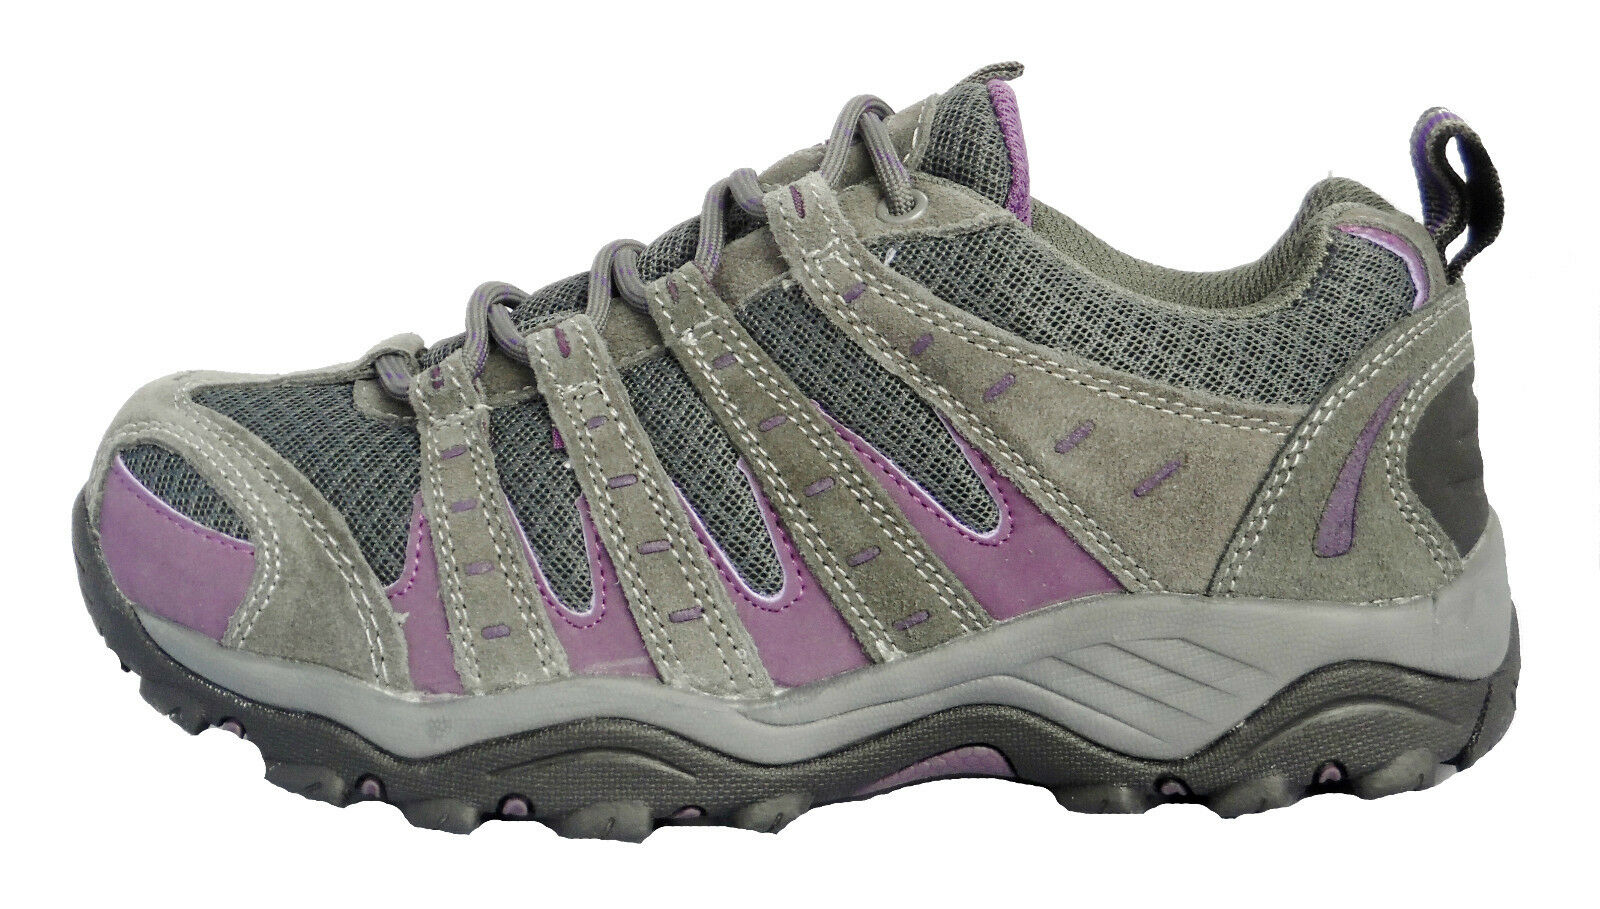 donna New Montana Waterrepous Northwest Territori Walking scarpe Trainers  UK 3 -8  Nuova lista